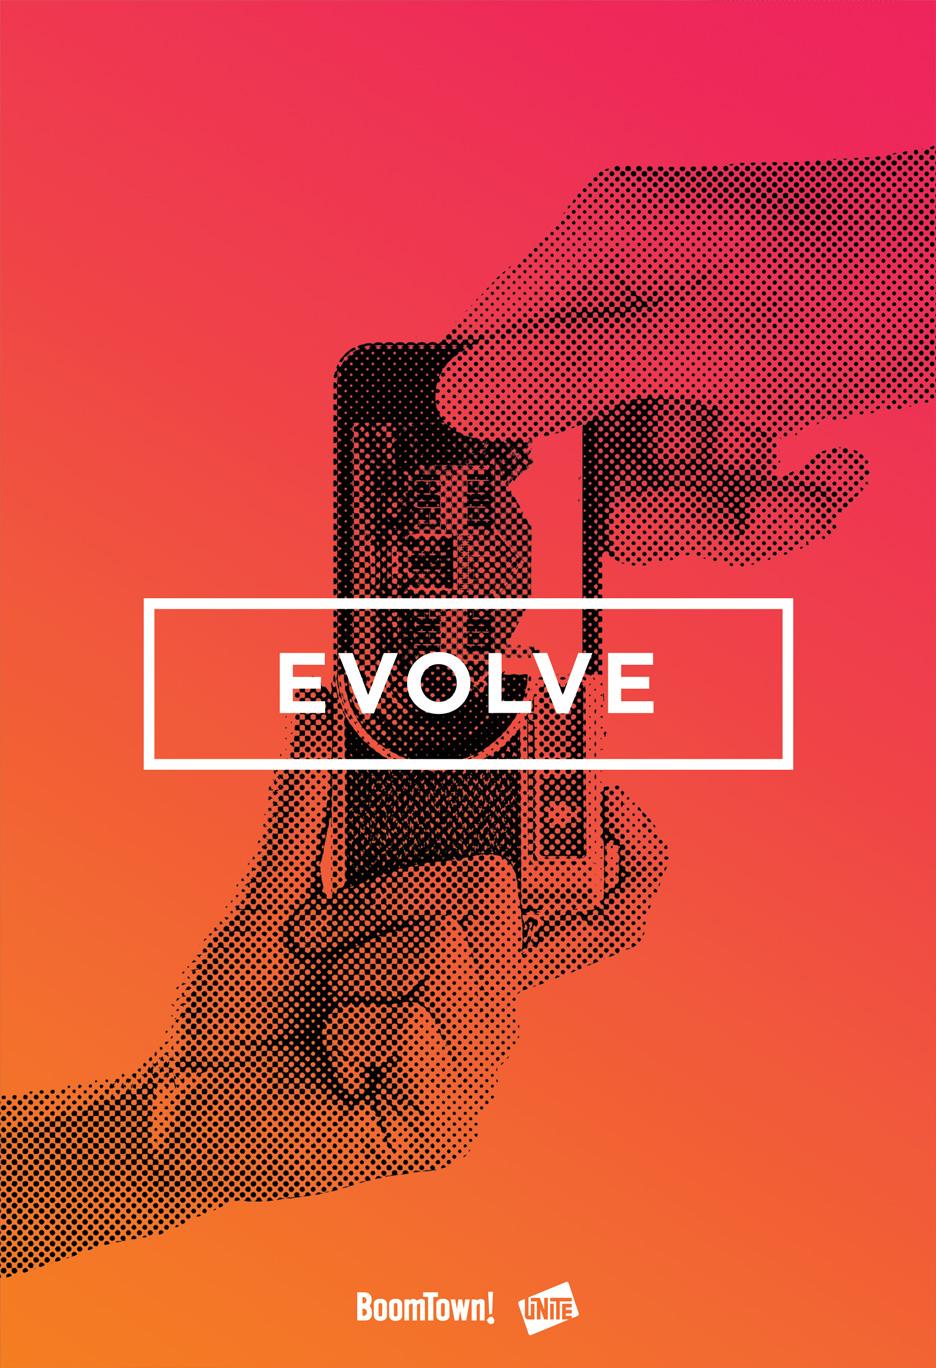 evolve-1.jpg